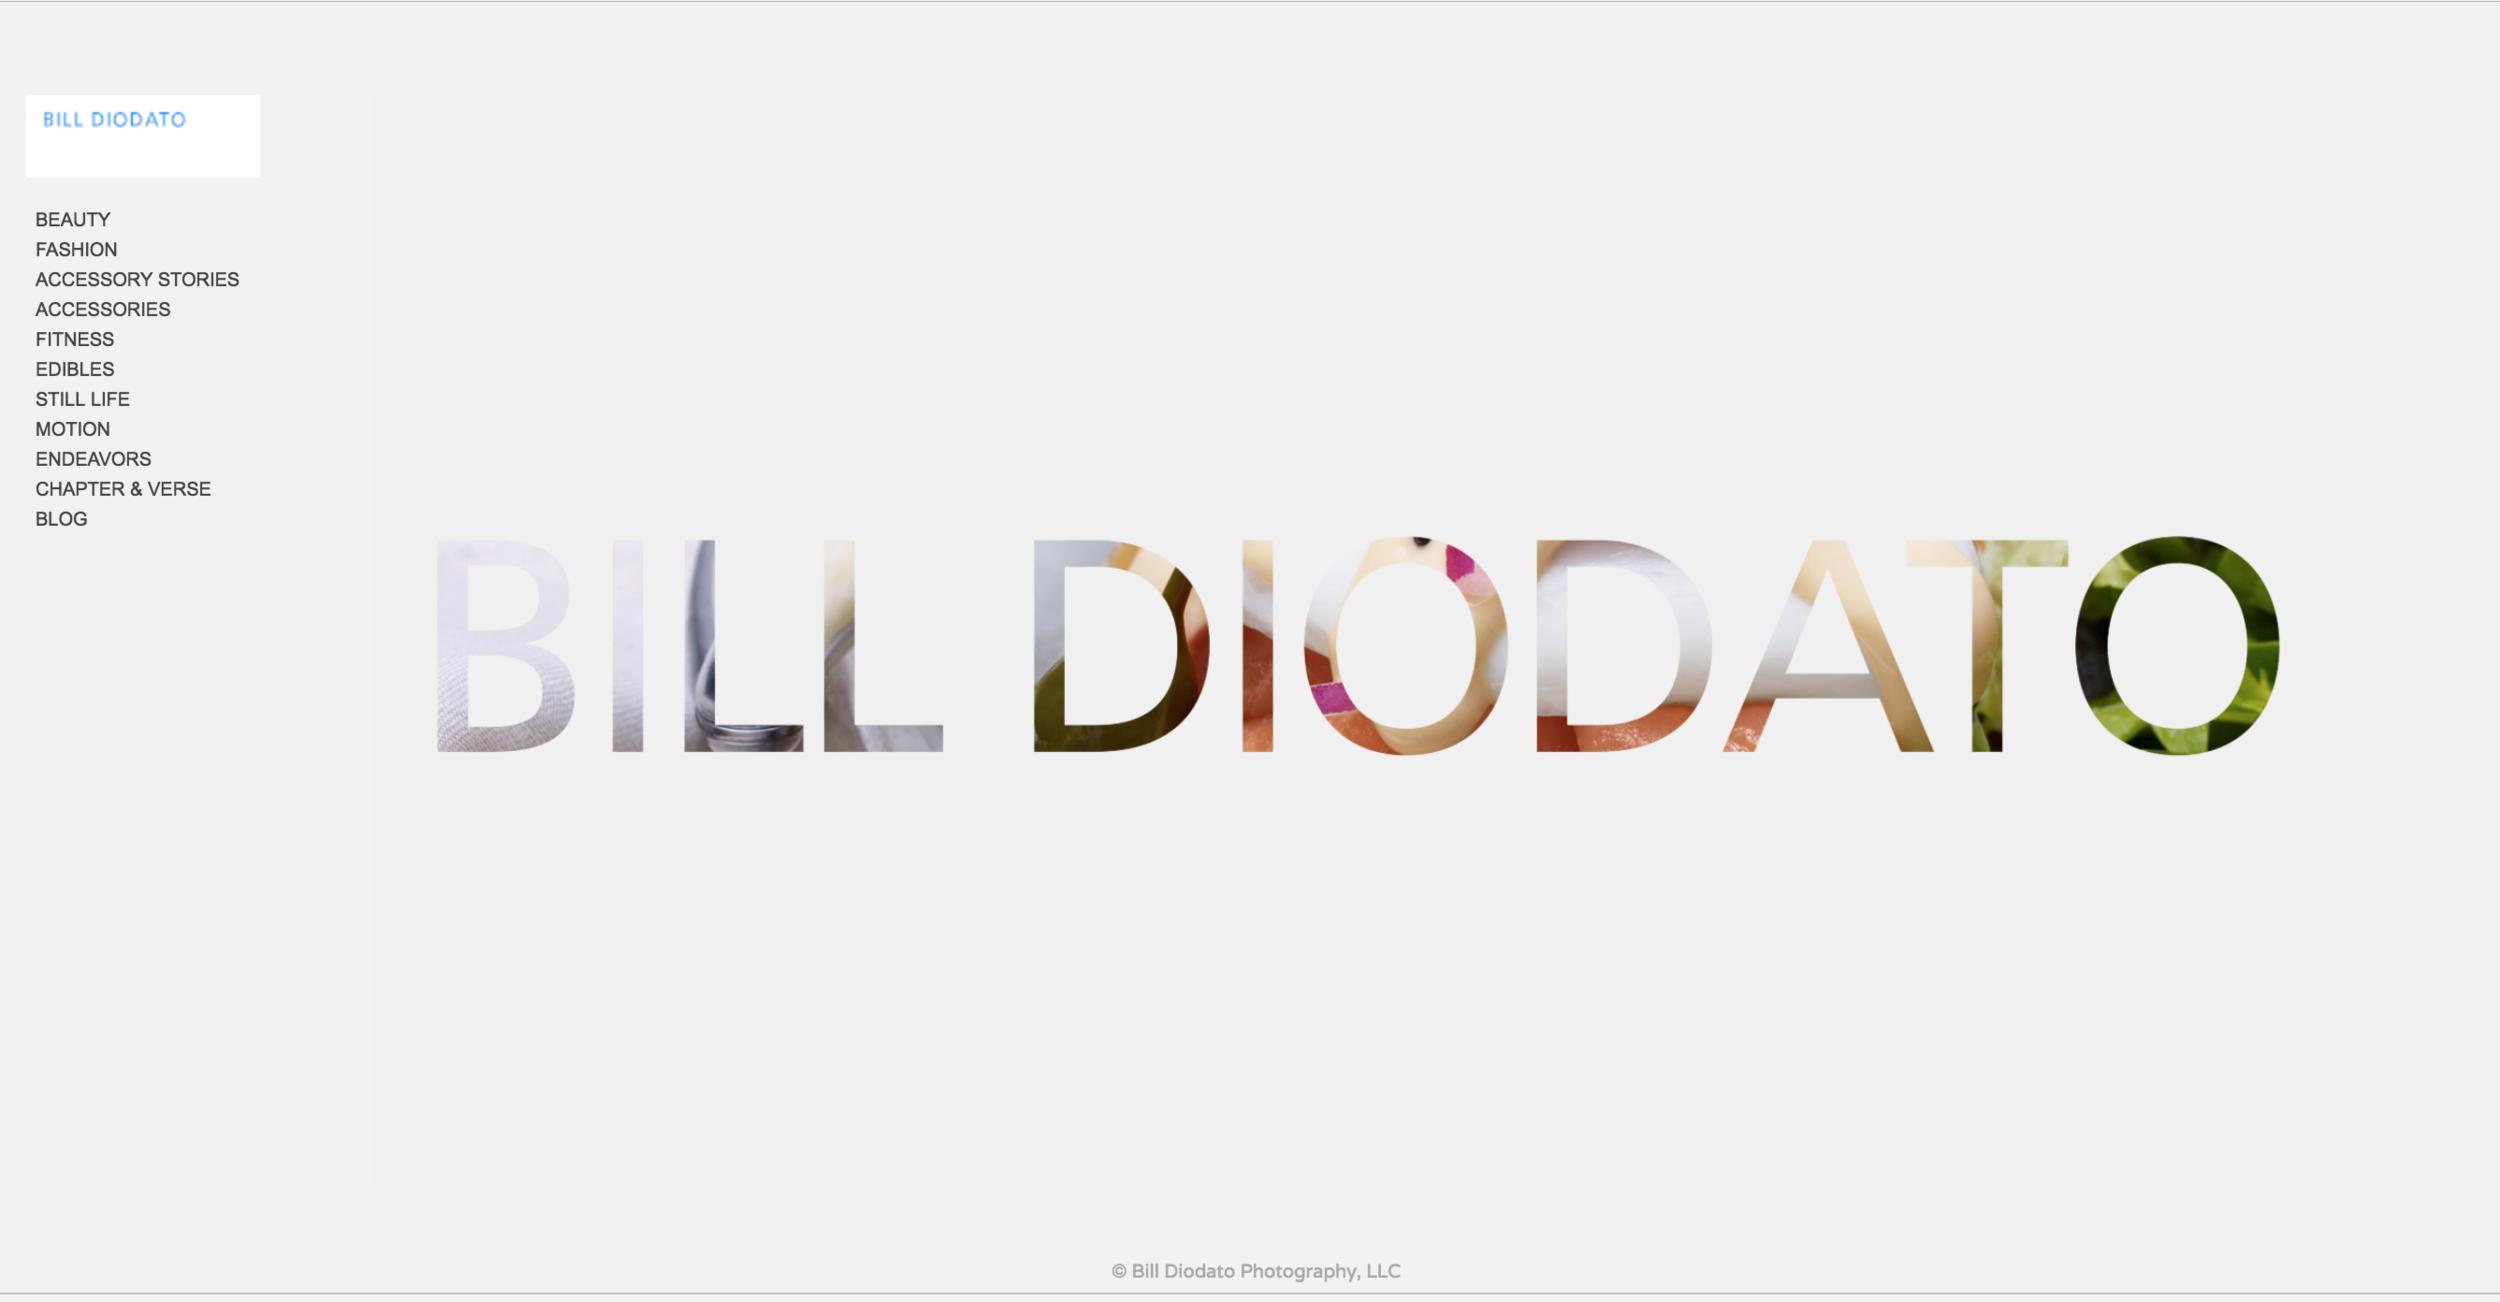 http://www.billdiodato.com